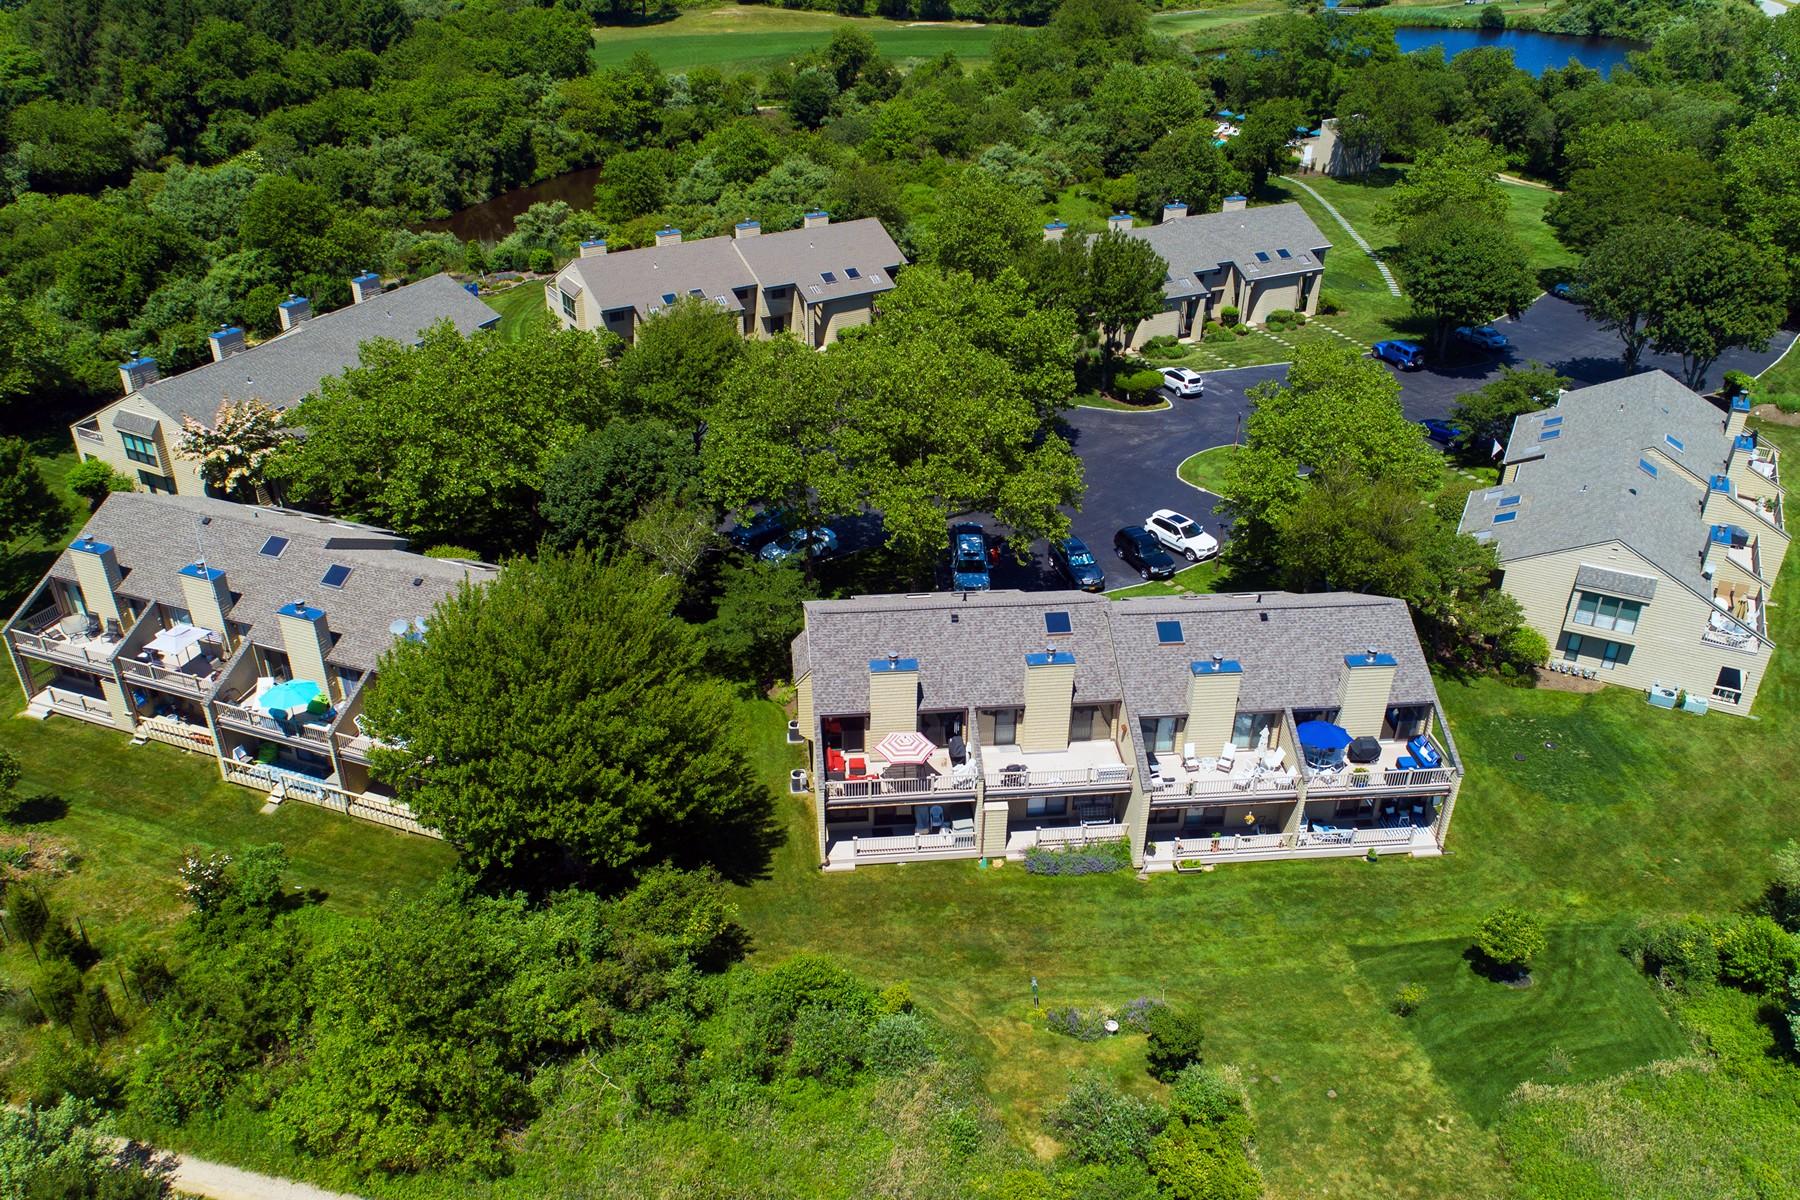 Condominium for Sale at 52 Fairway Pl , Montauk, NY 11954 52 Fairway Pl 20 Montauk, New York 11954 United States